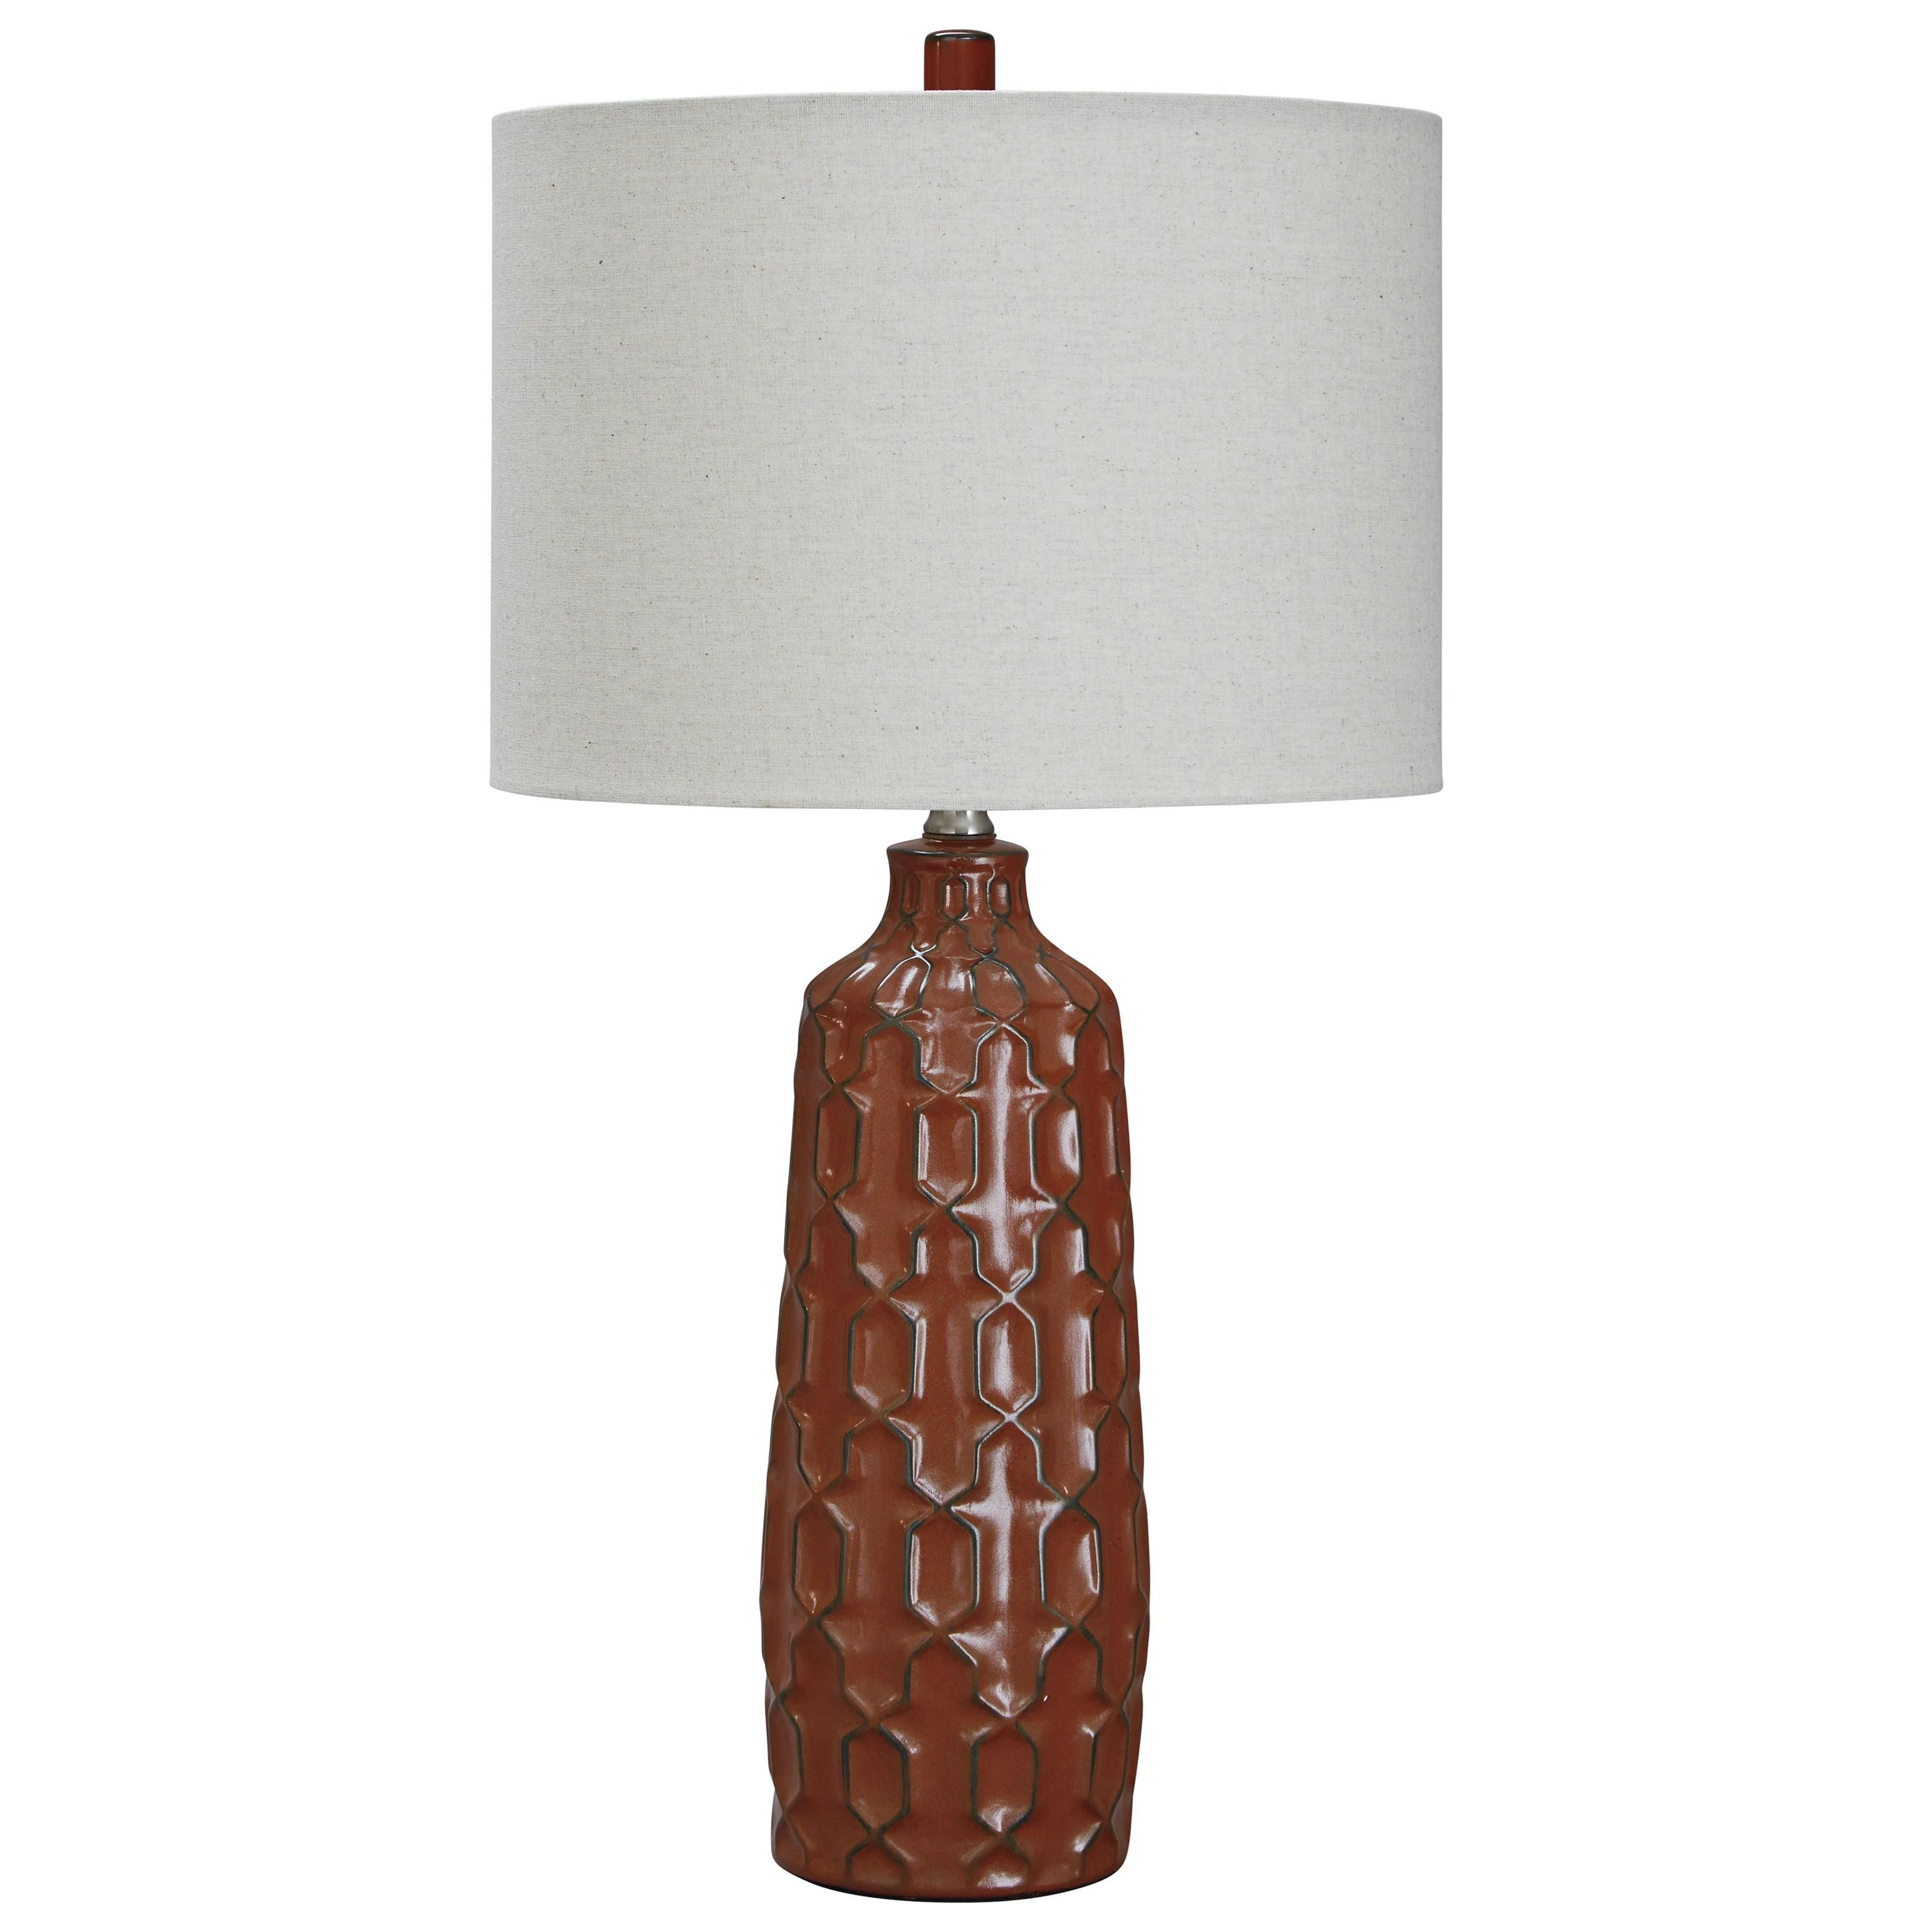 Set of 2 Mab Ceramic Table Lamps